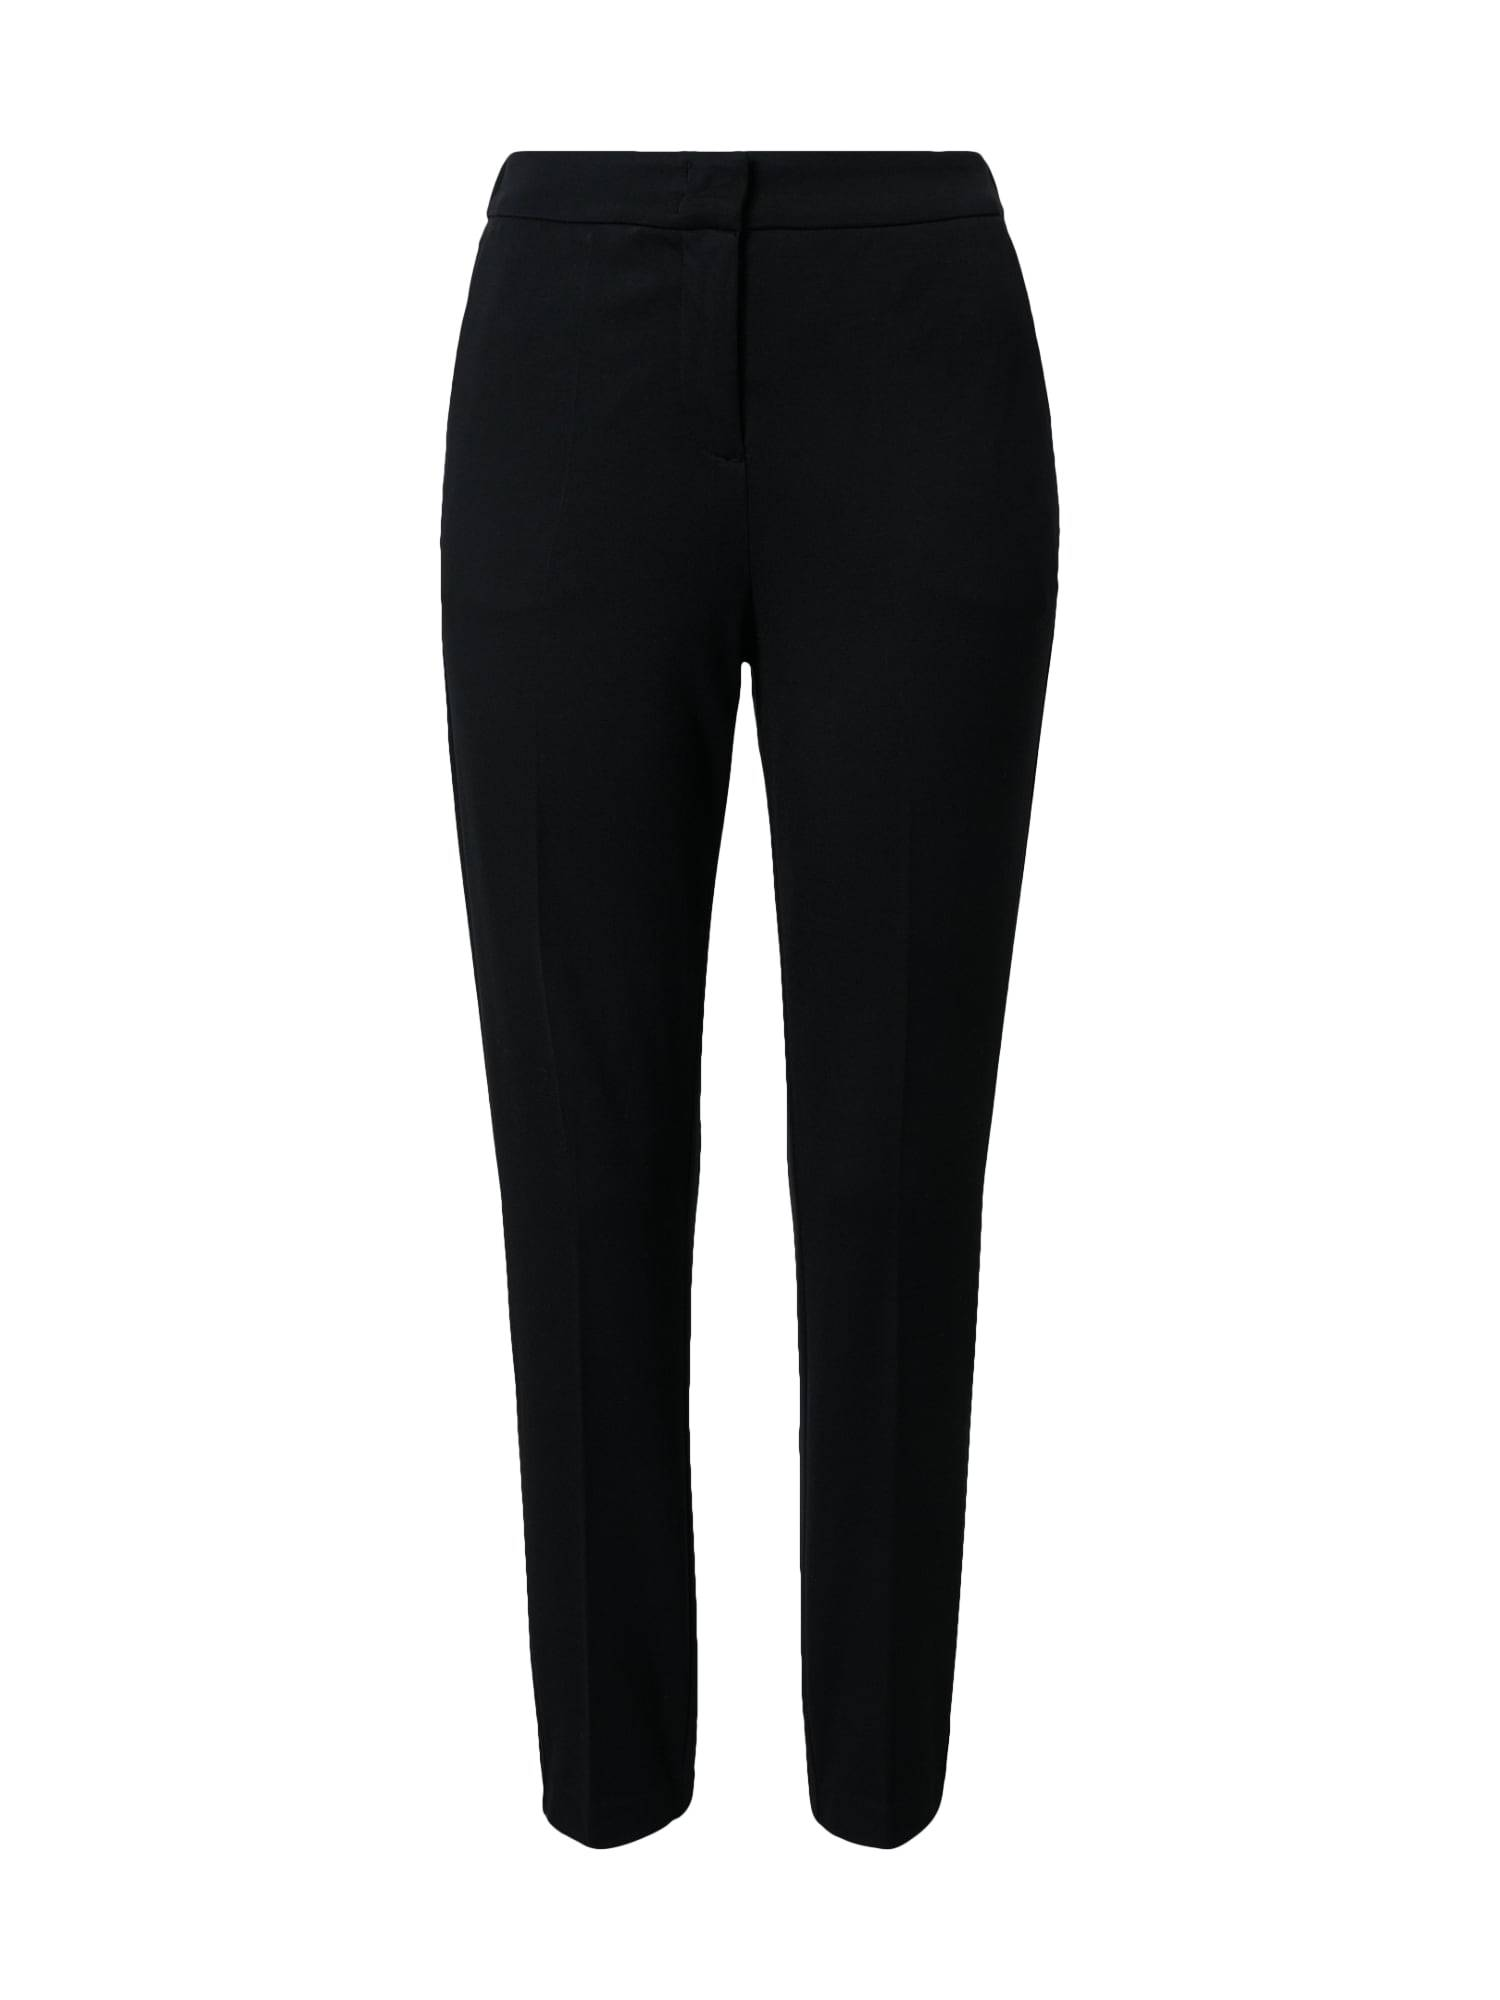 MINE TO FIVE Pantalon à plis  - Noir - Taille: XS - female